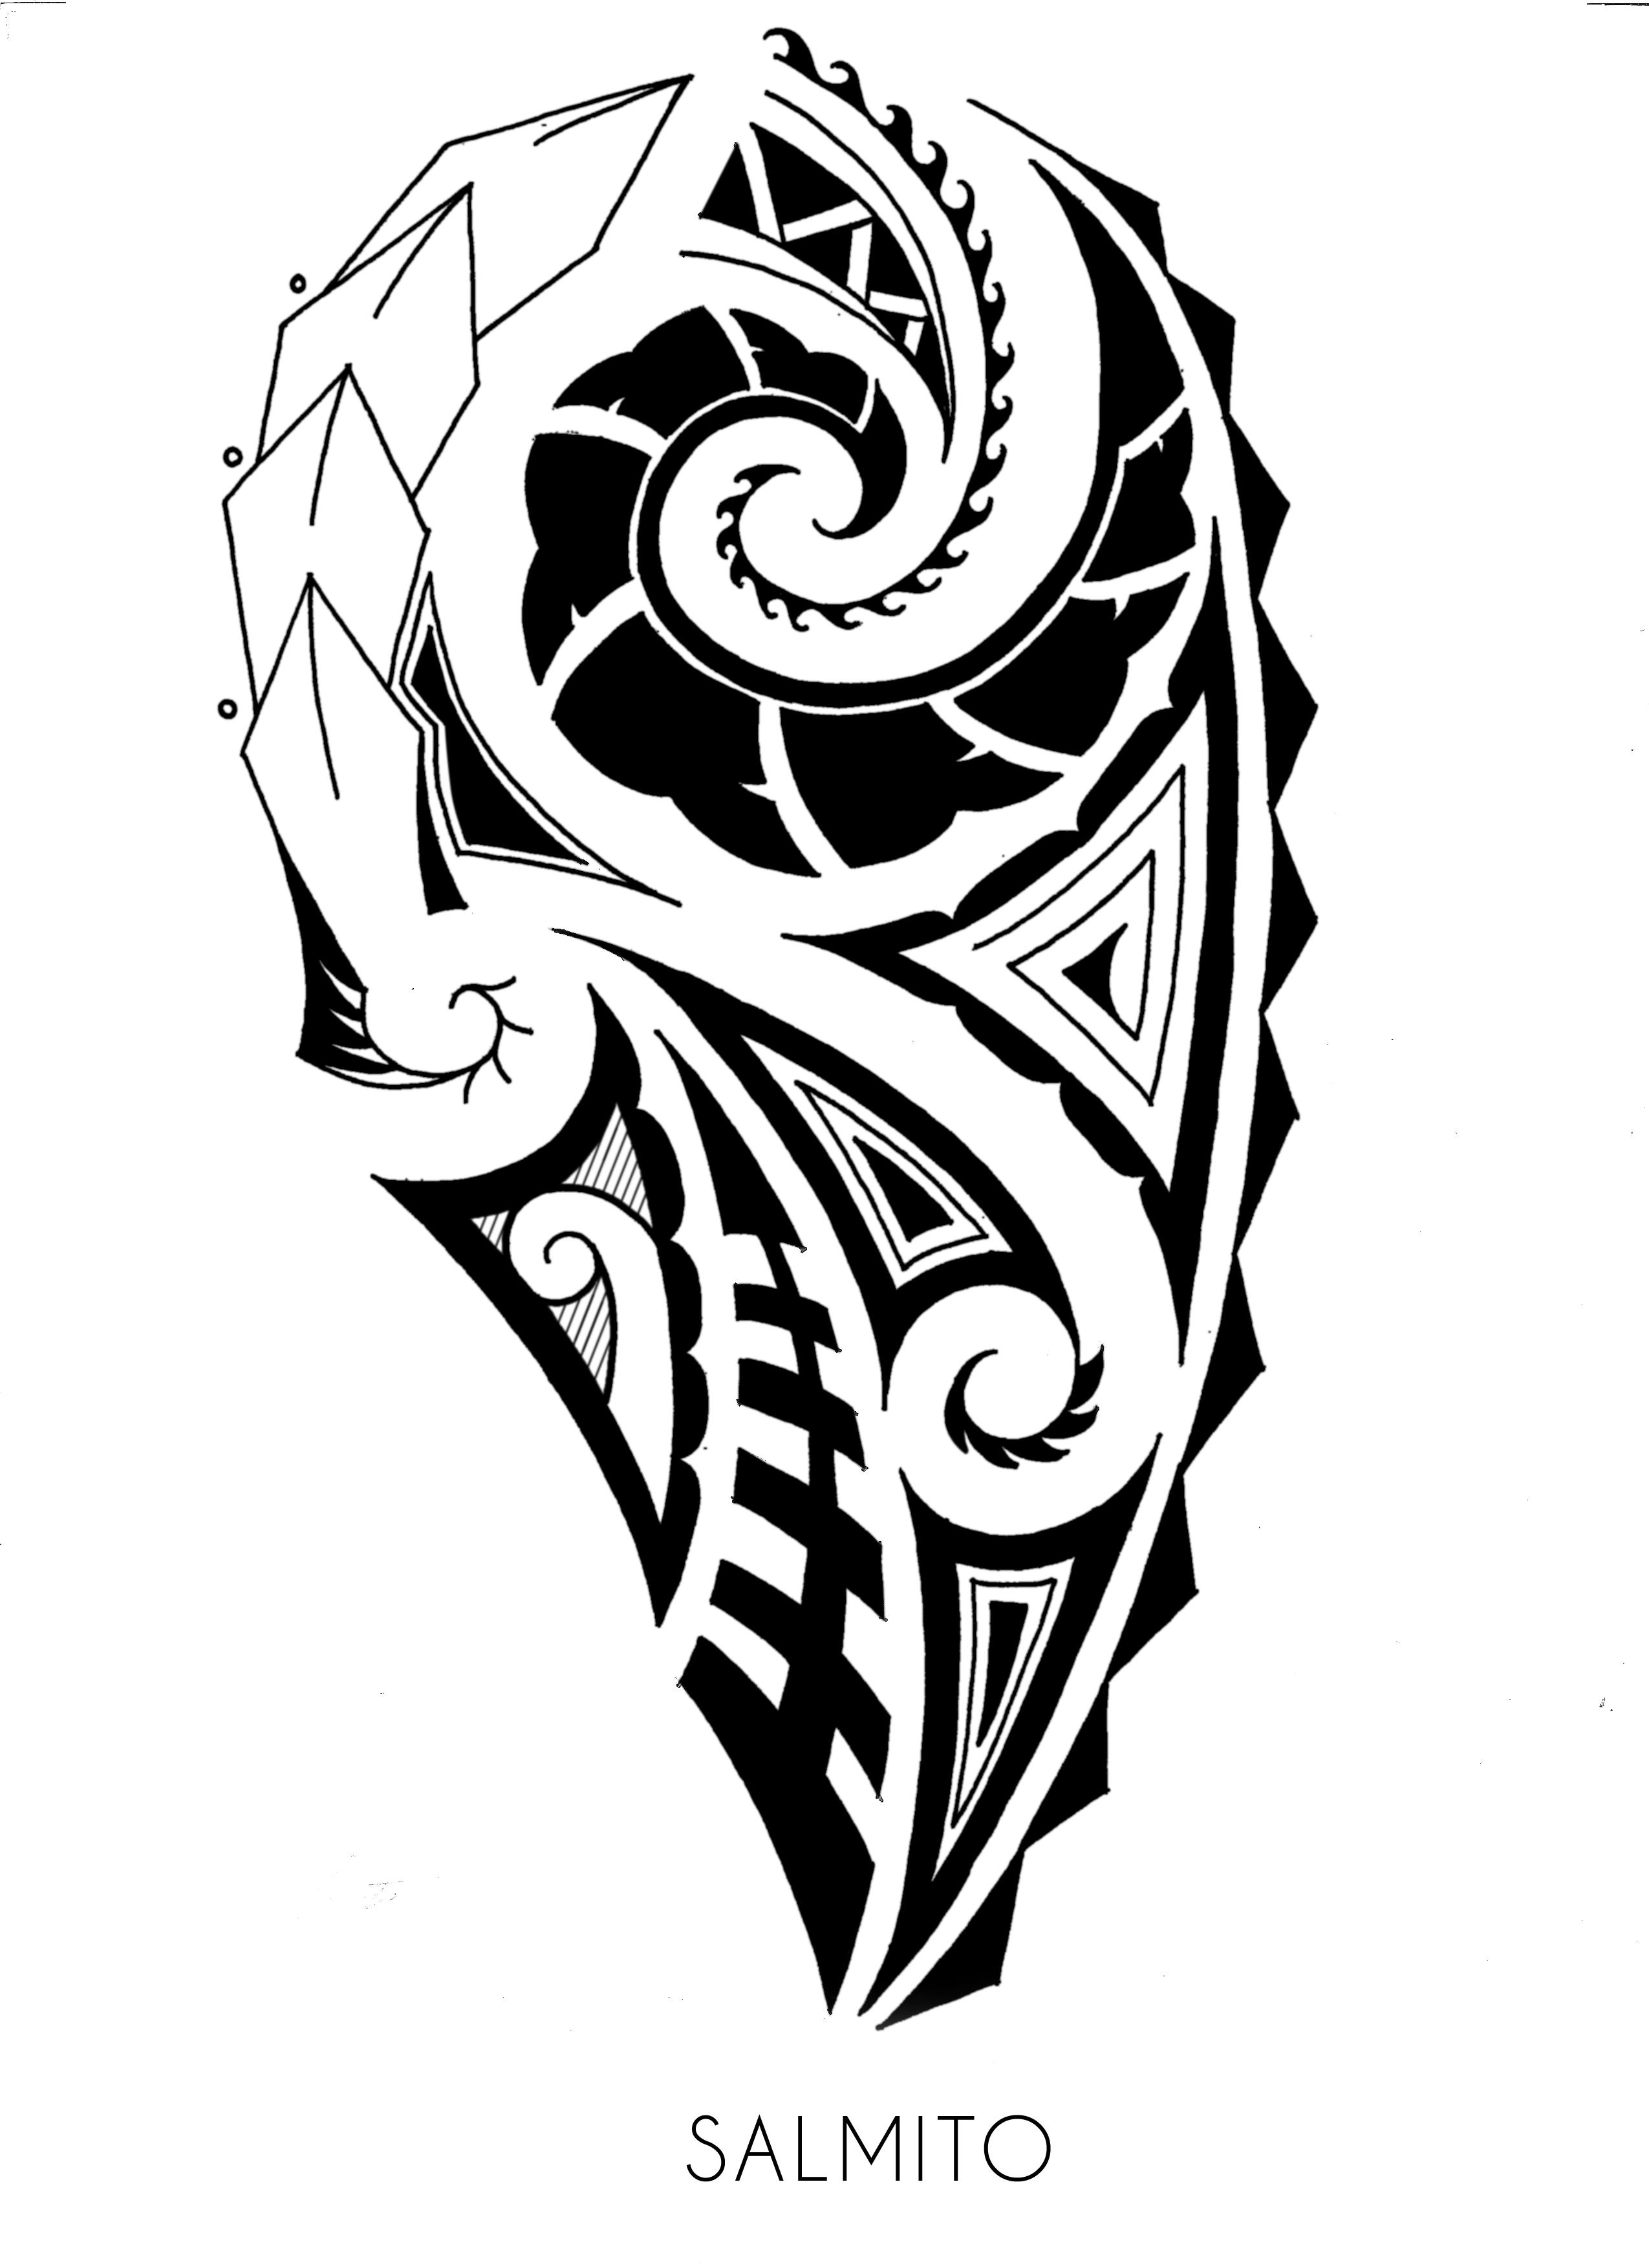 Super maori_tatto___shoulder_by_salmito-d62zey7.png (2550×3507  RX45